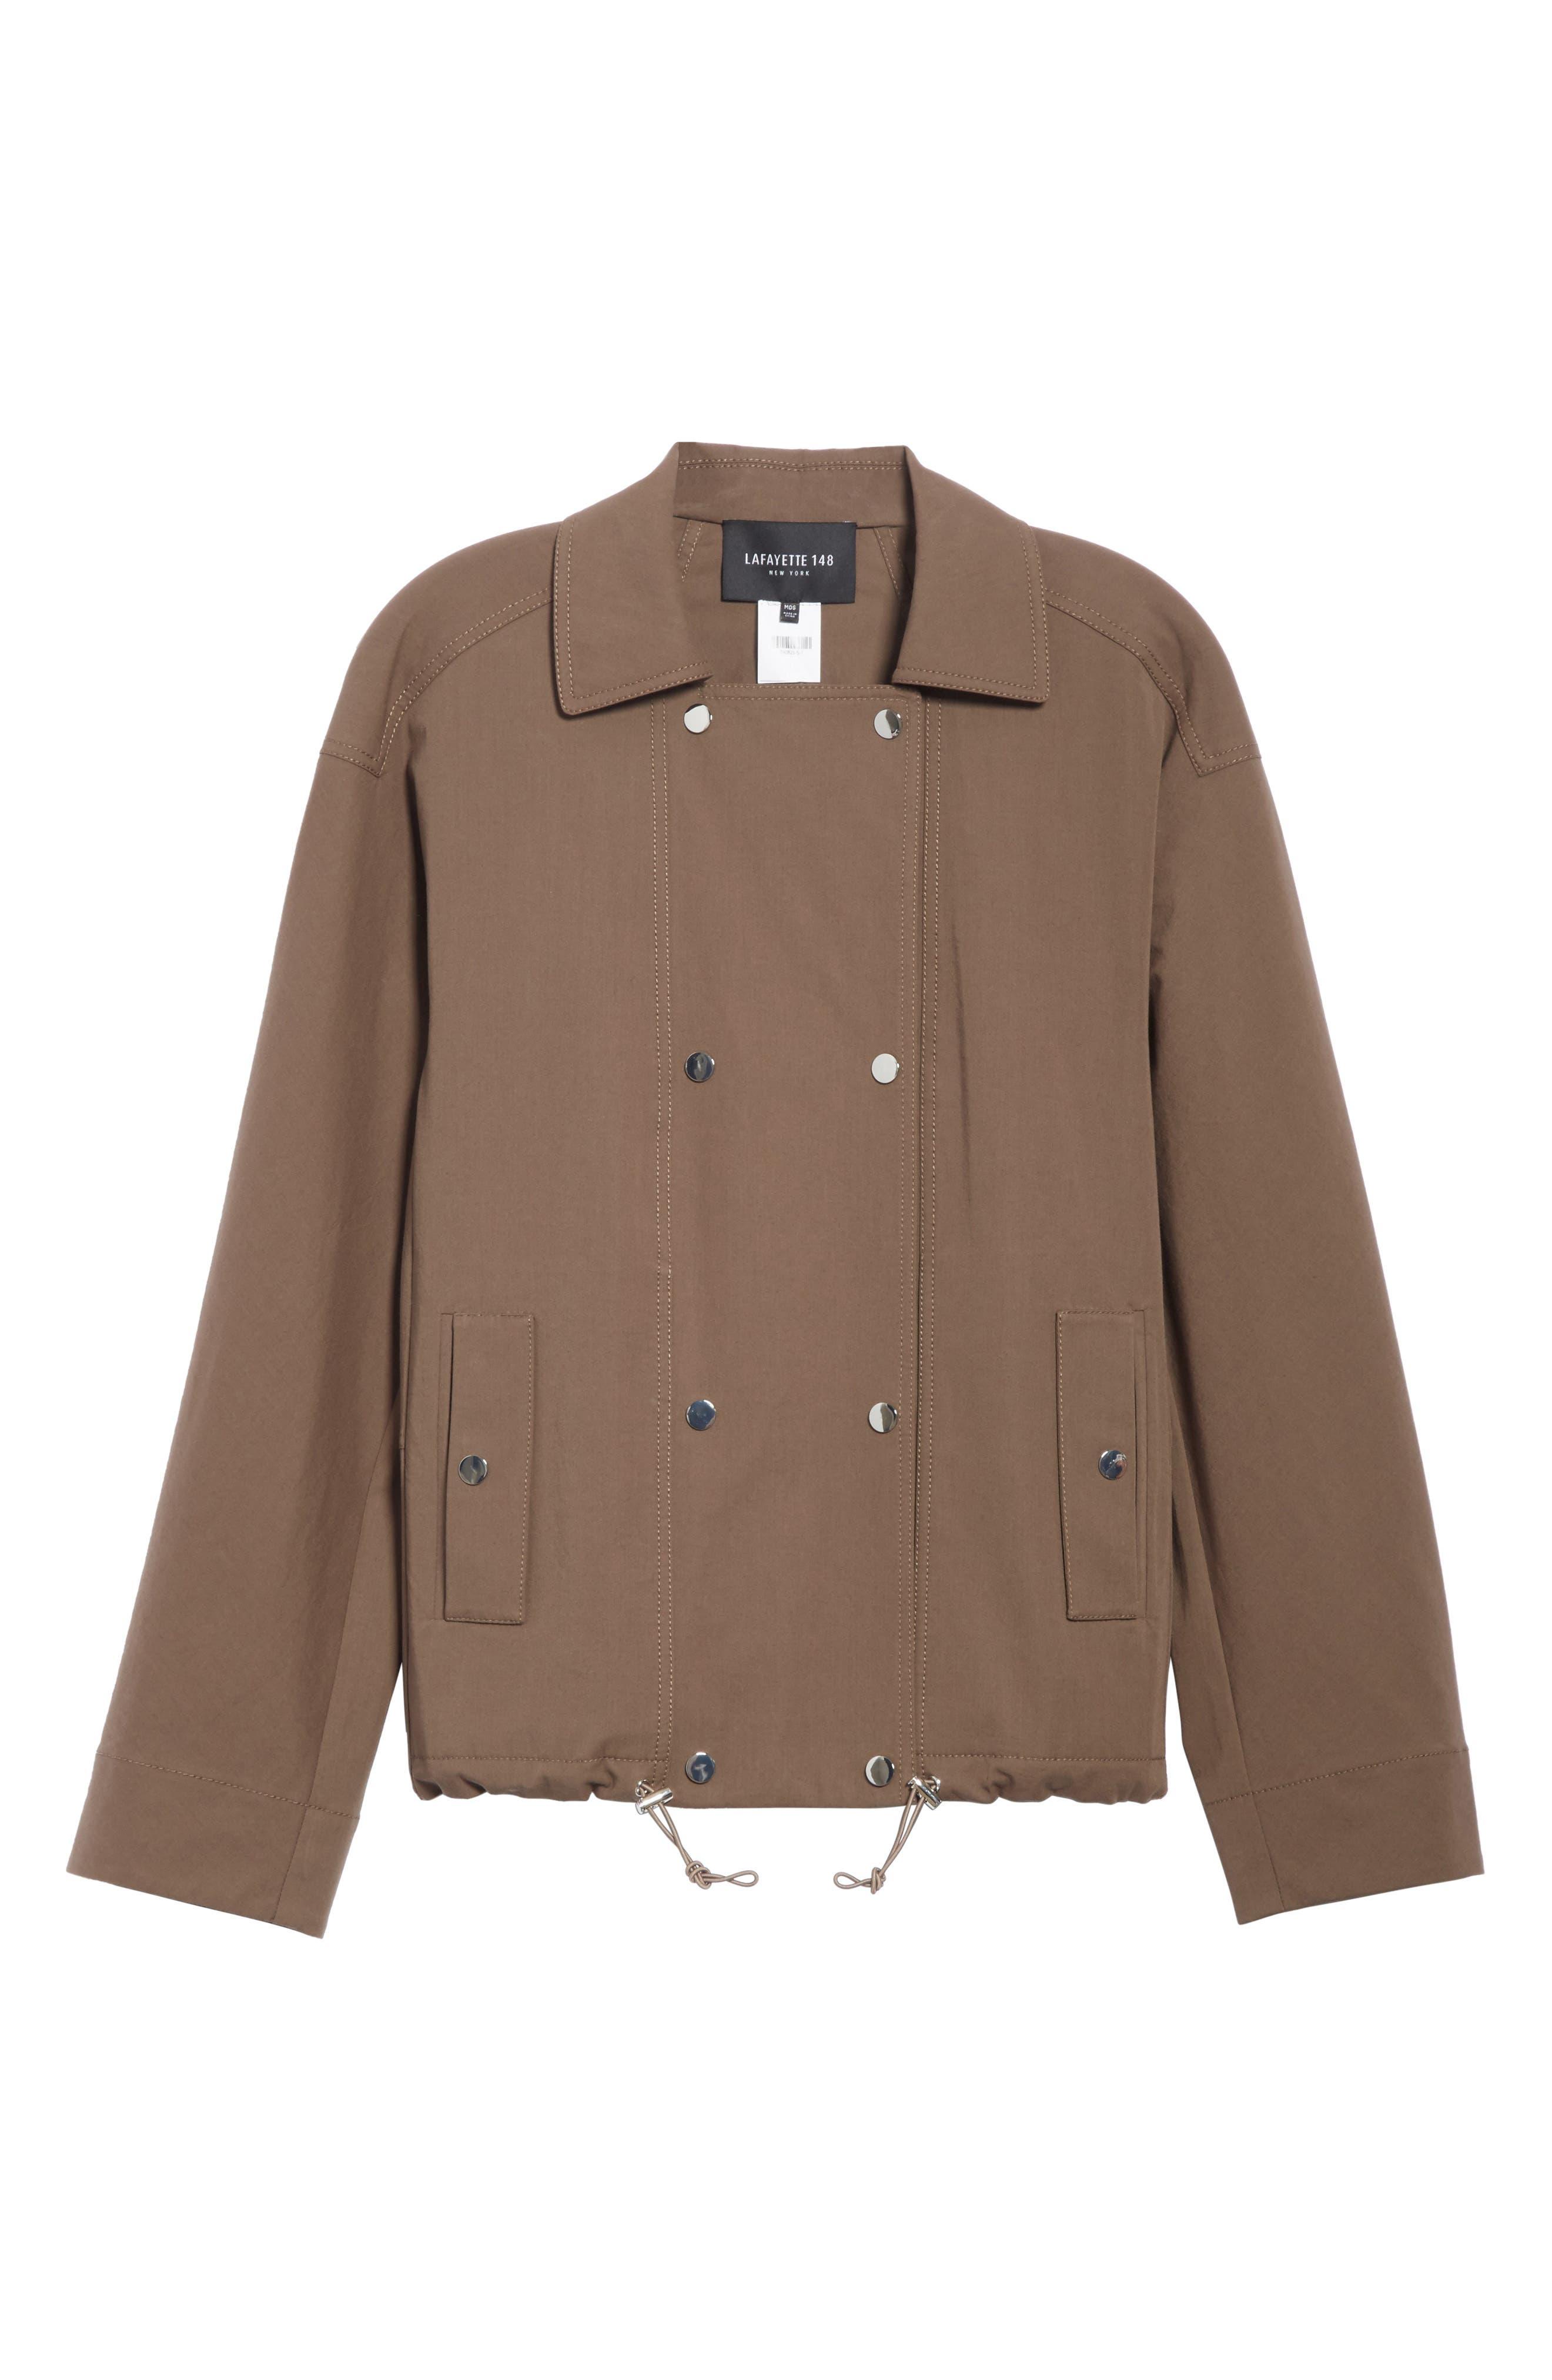 Maxton Jacket,                             Alternate thumbnail 7, color,                             Nougat